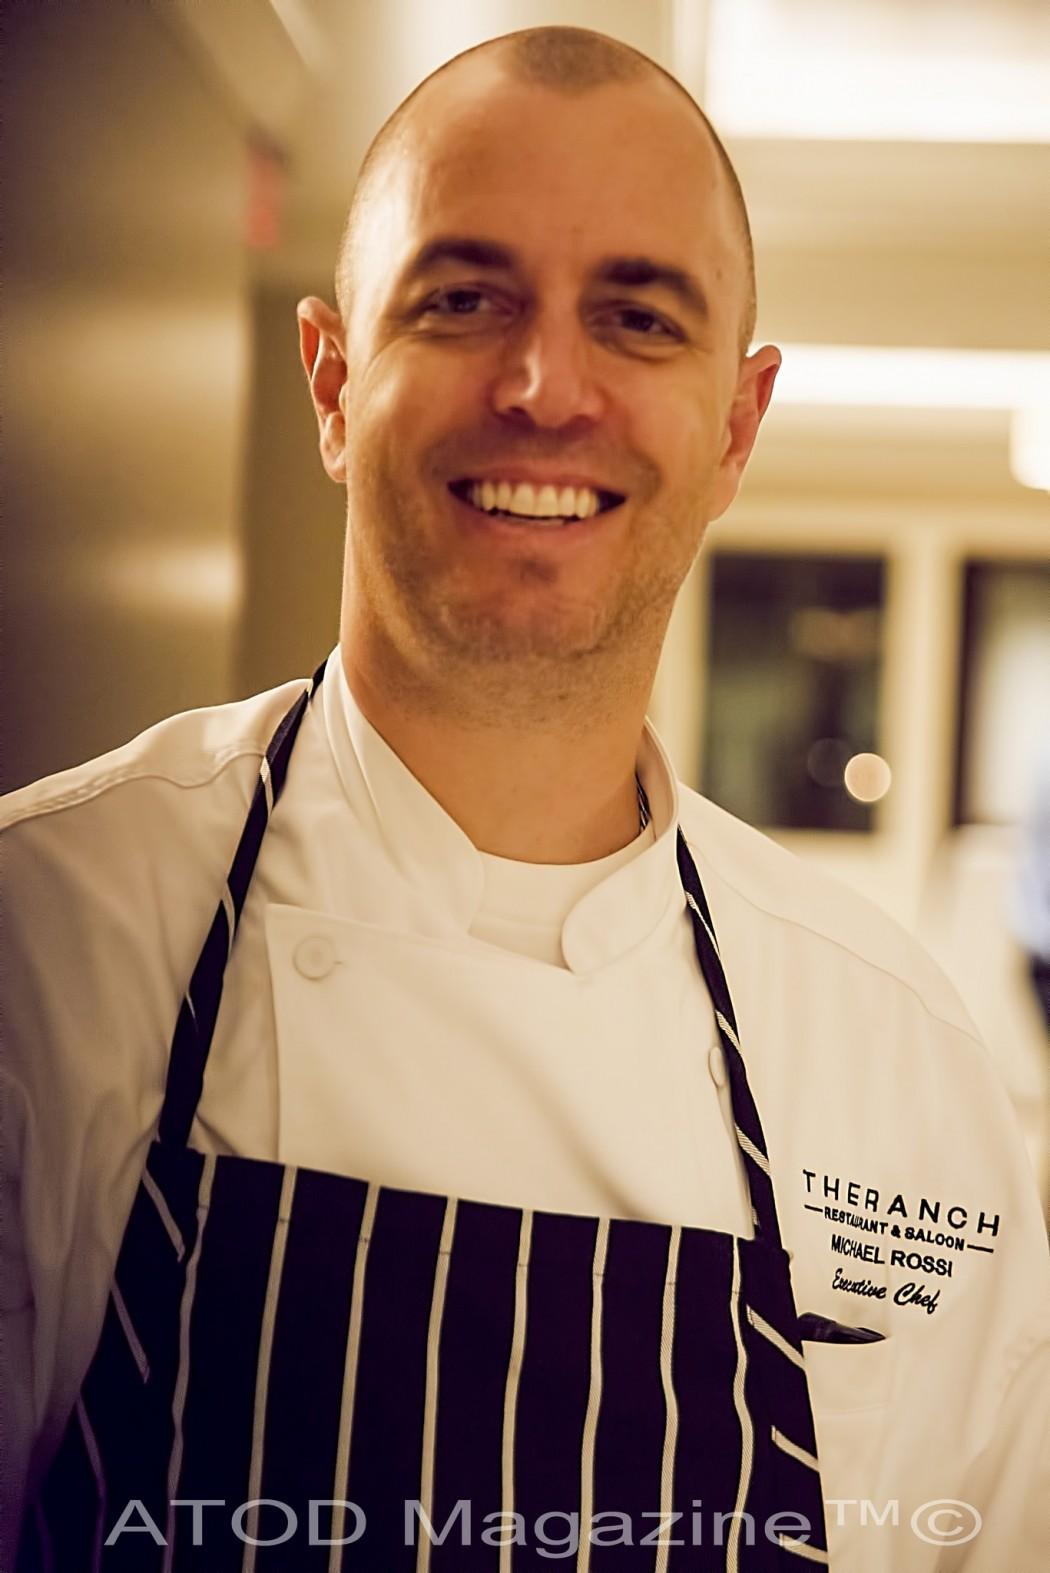 ATOD TheRanch ChefMichaelRossi1